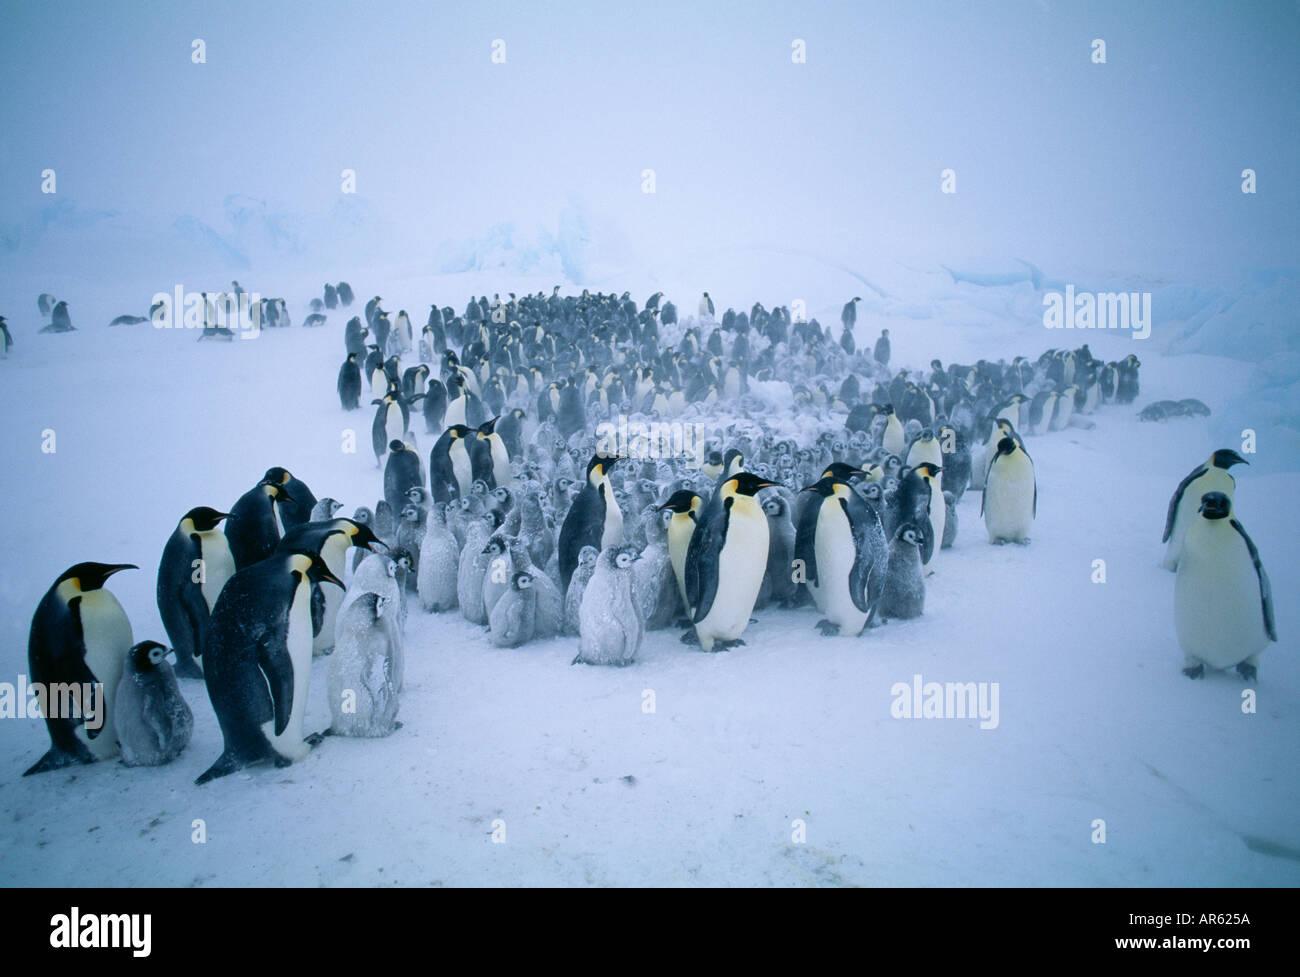 Emperor Penguin Aptenodytes forsteri group gathered together during storm Weddell Sea Antarctica - Stock Image